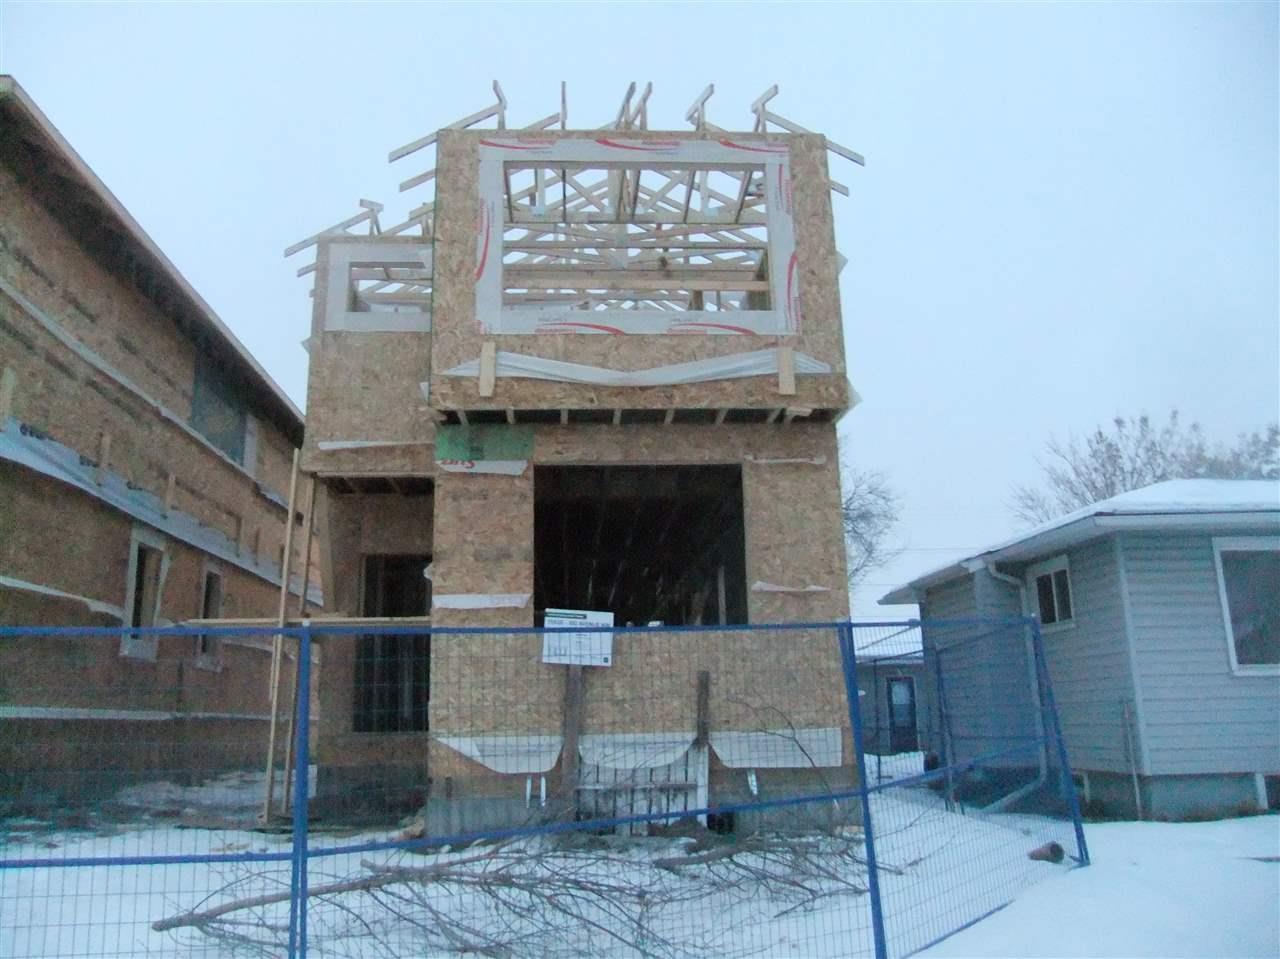 15924 100 Av Nw, Edmonton, Alberta  T5P 0L2 - Photo 2 - E4138942